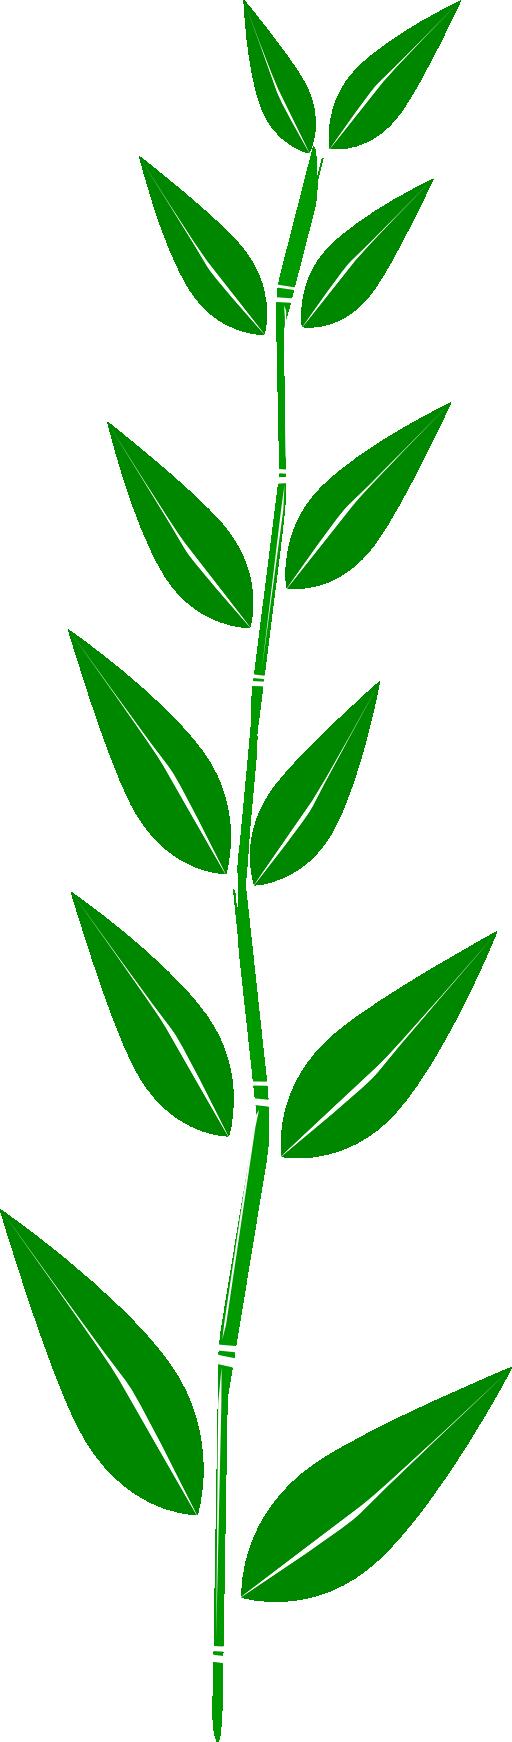 Leaf clipart borders. Clip art free panda